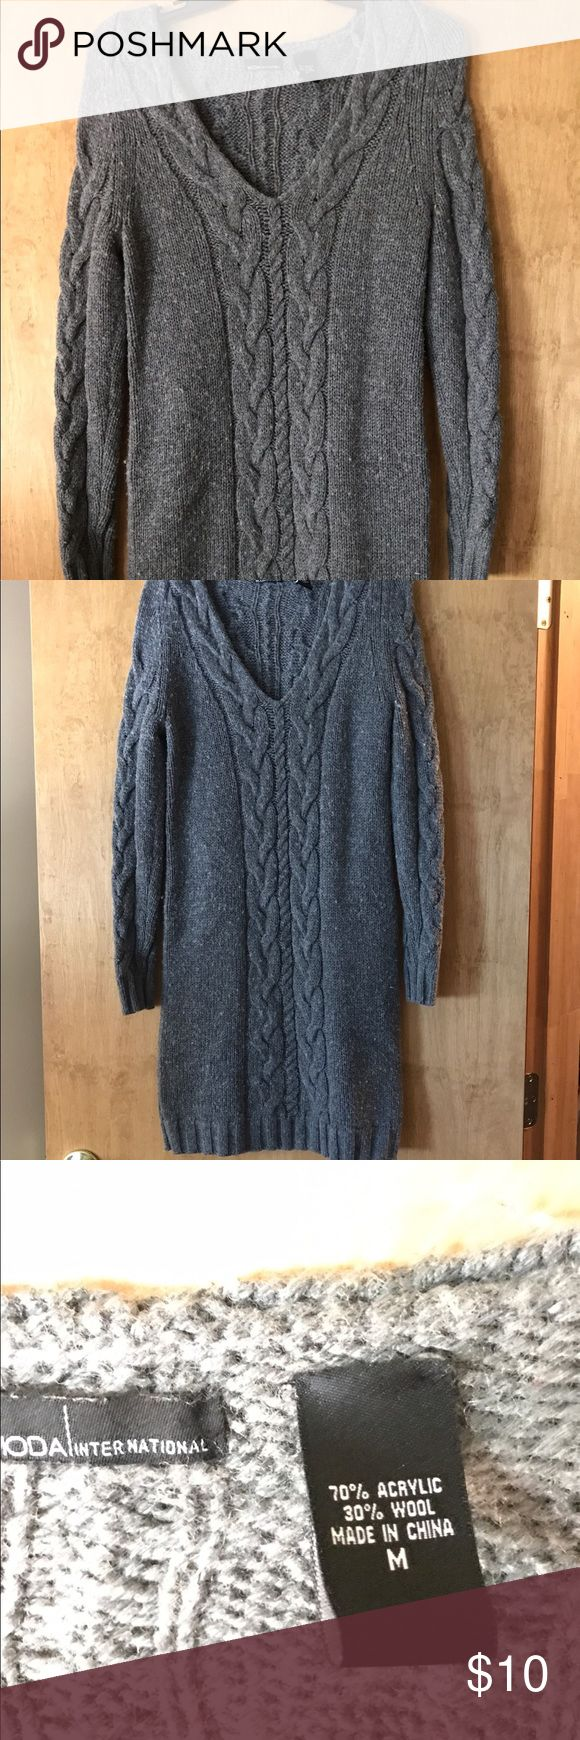 Grey sweater dress Cute sweater dress hits right above the knee! Moda International Dresses Midi